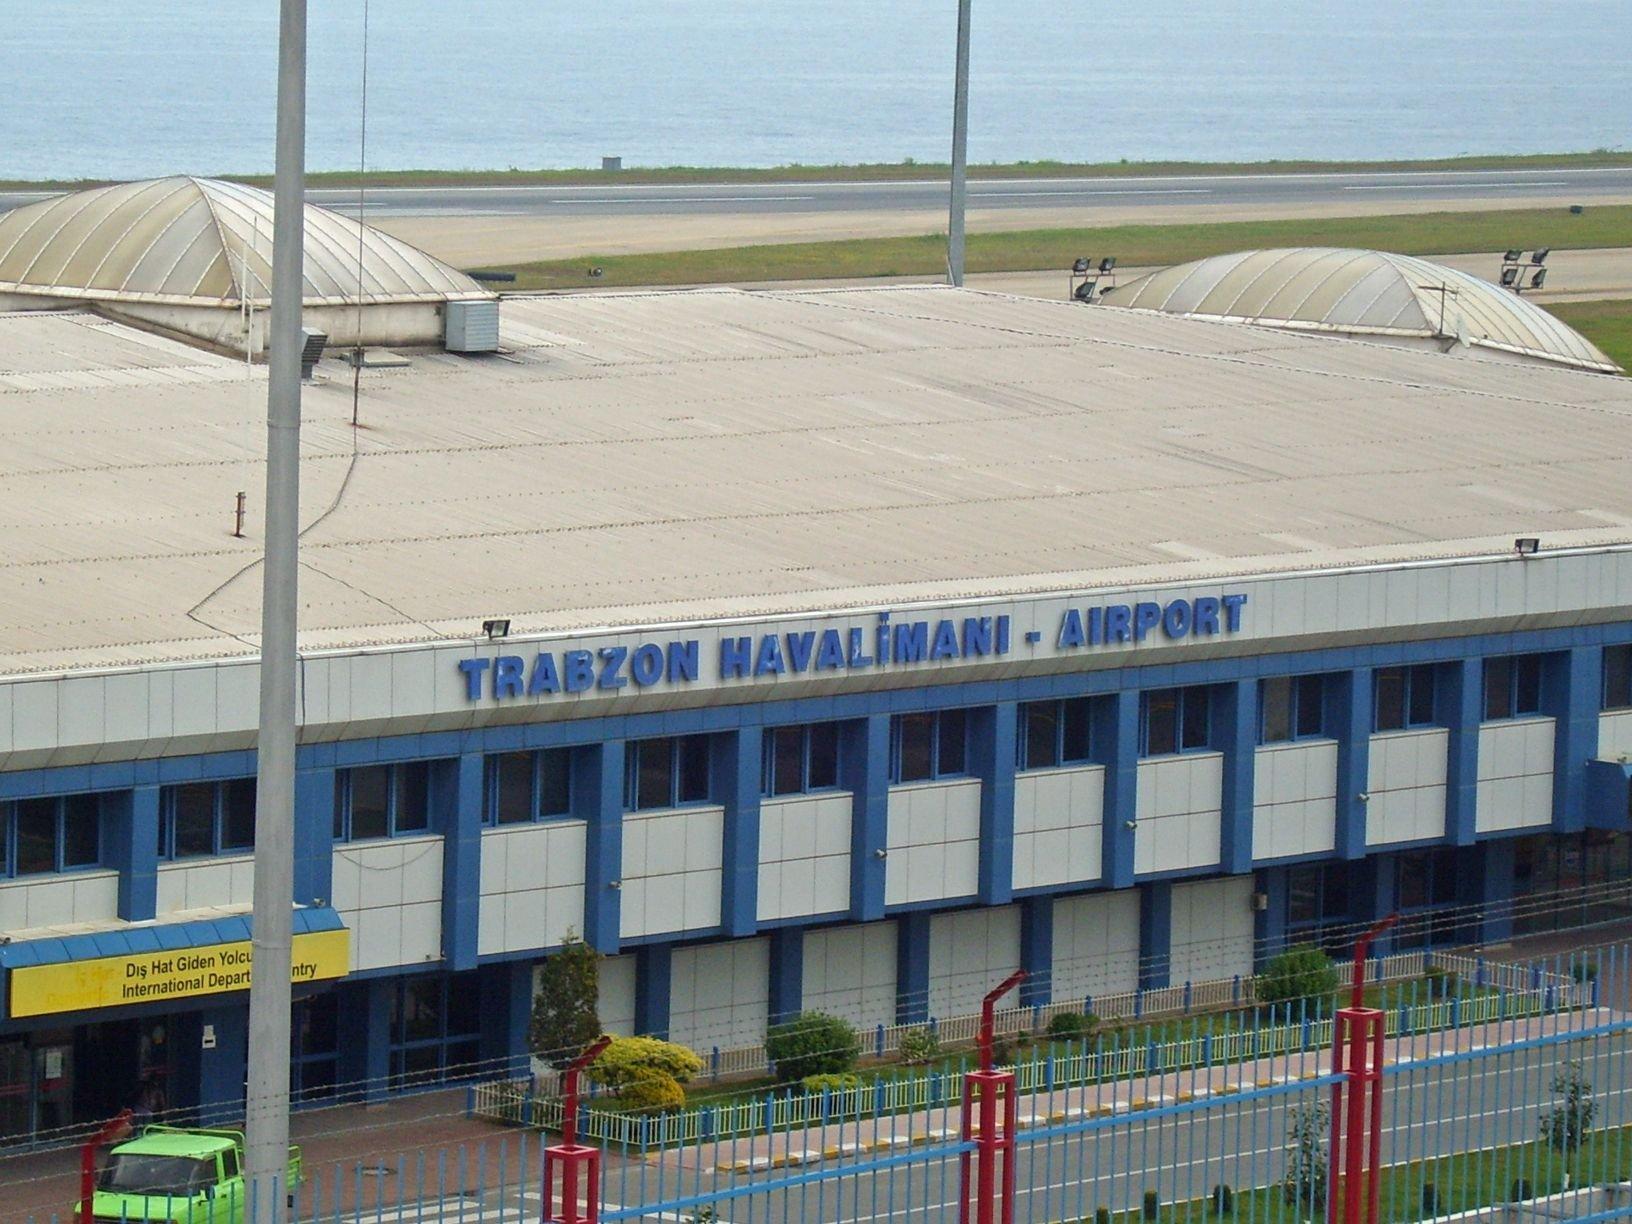 Trabzon Havalimanı Parmak Isırttı